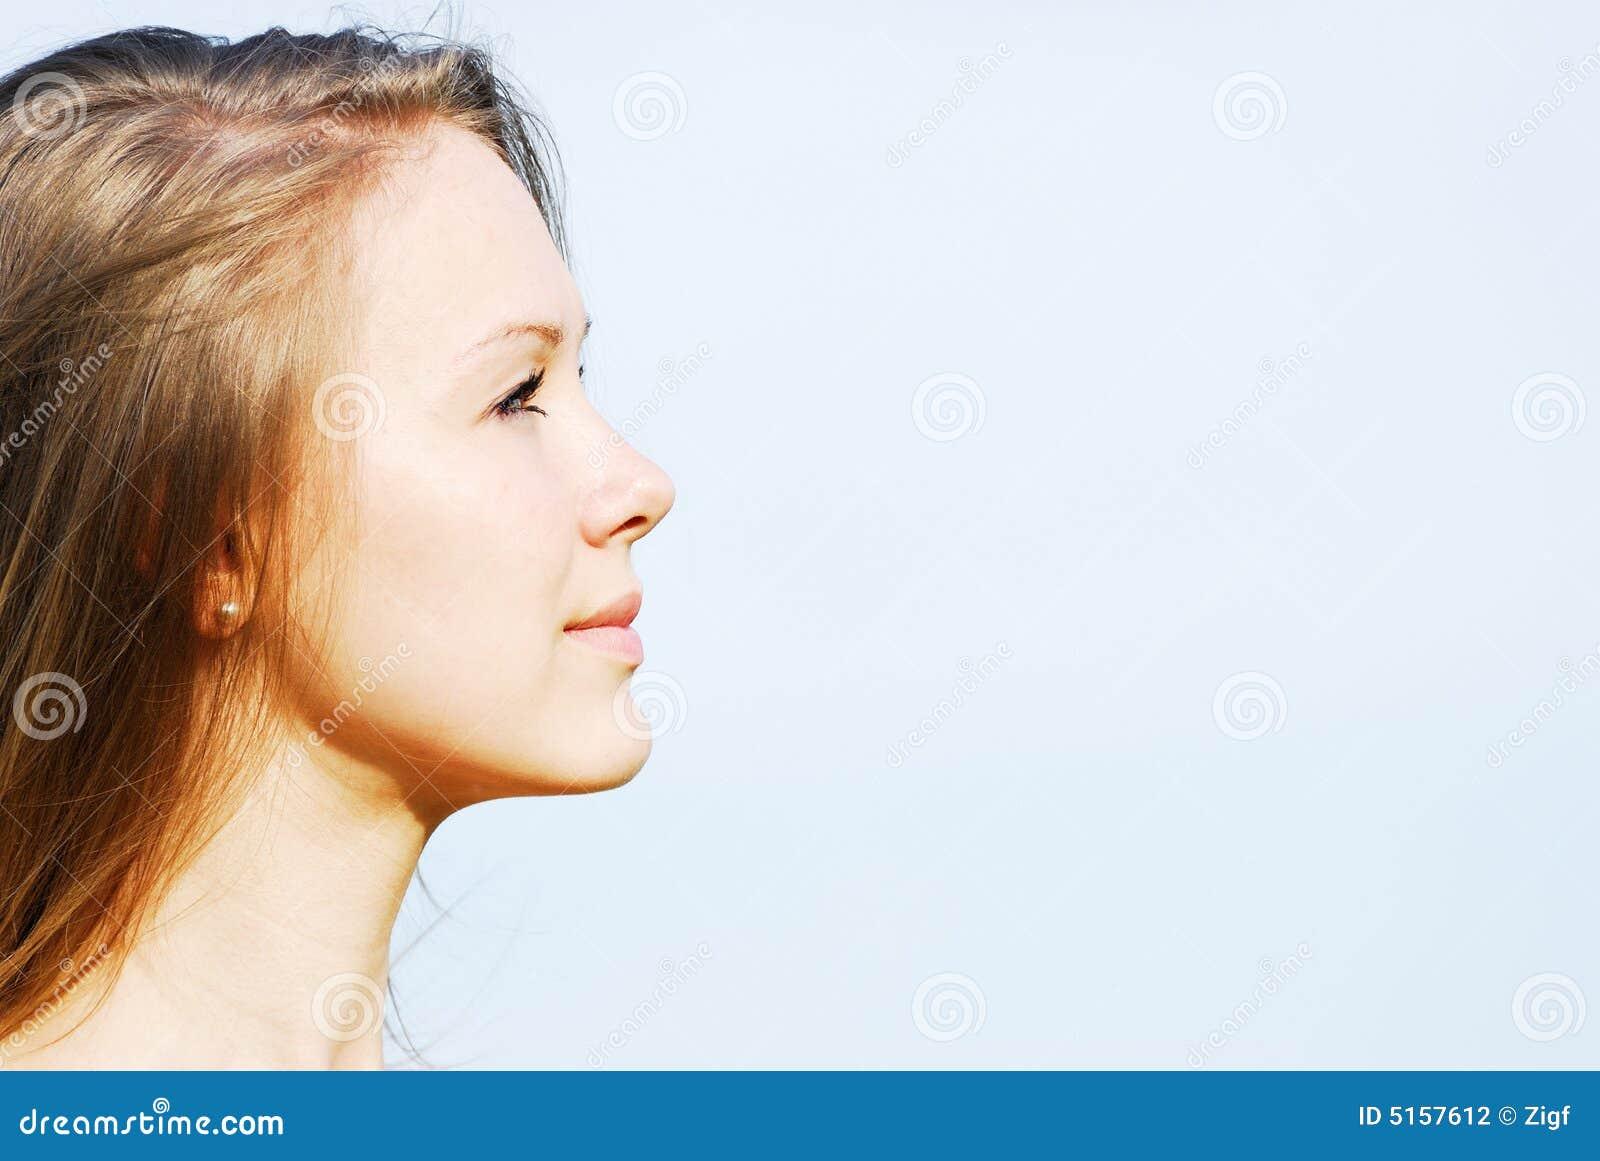 Profil fille